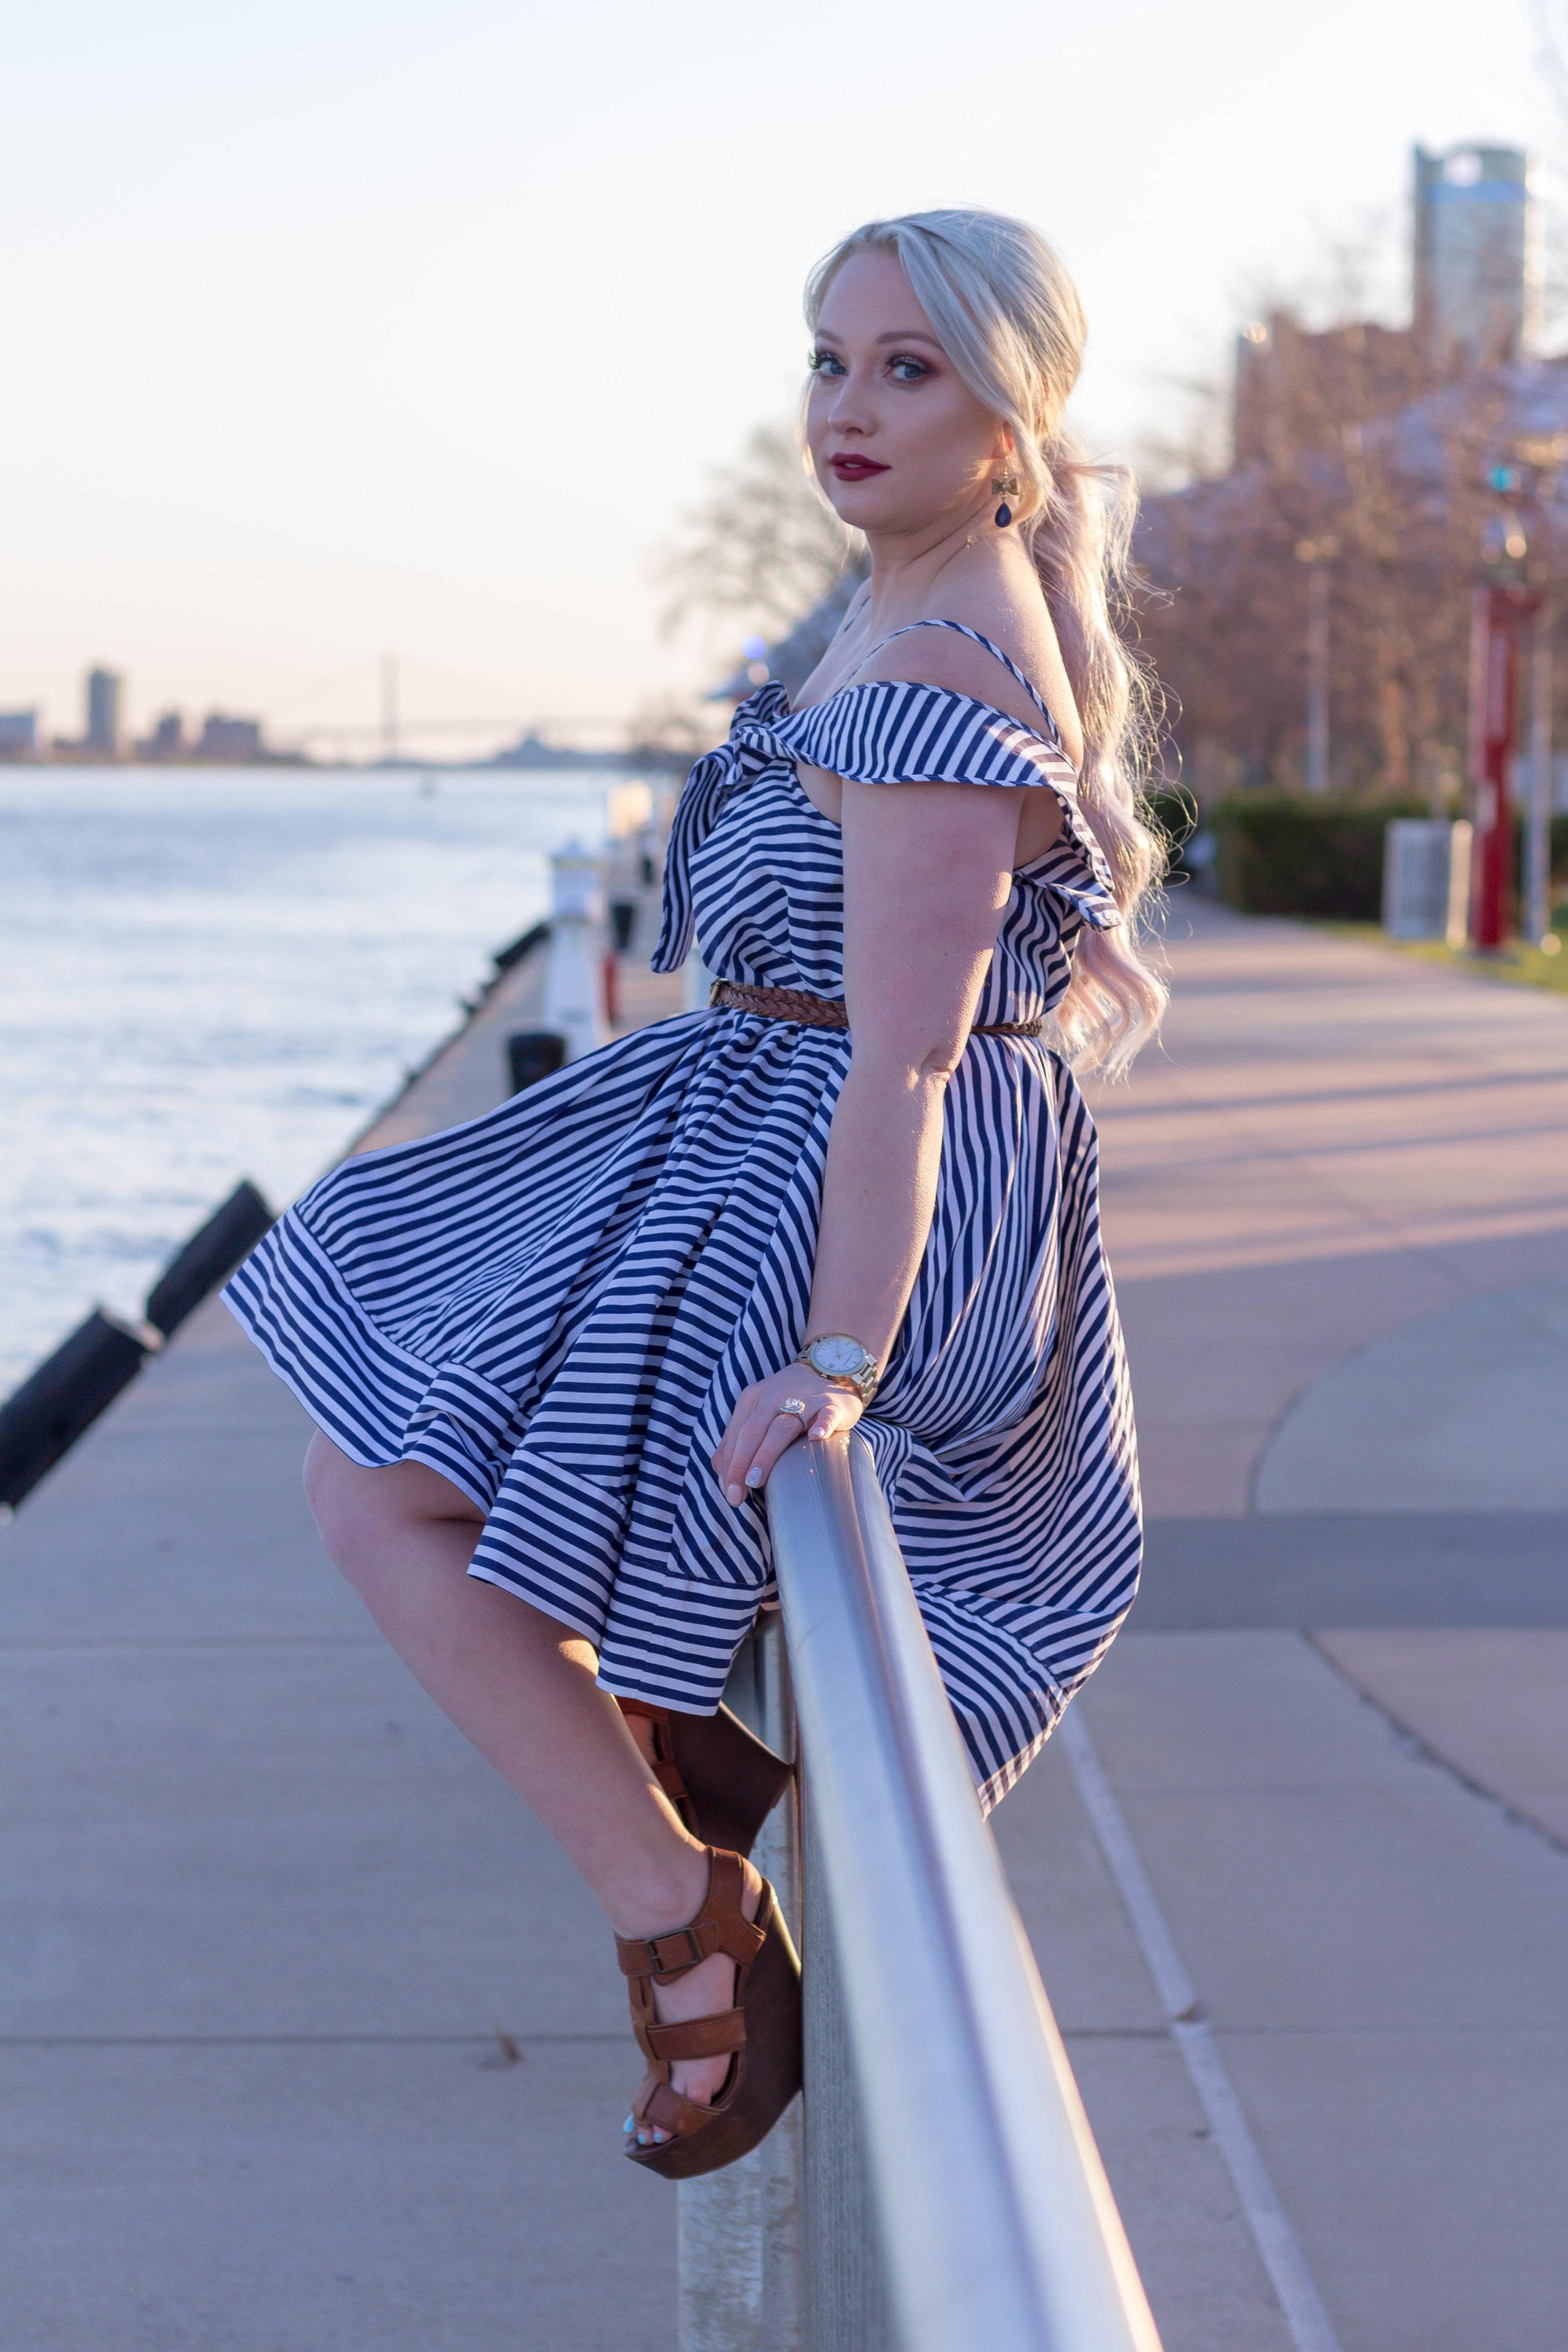 Riverwalk Stripes